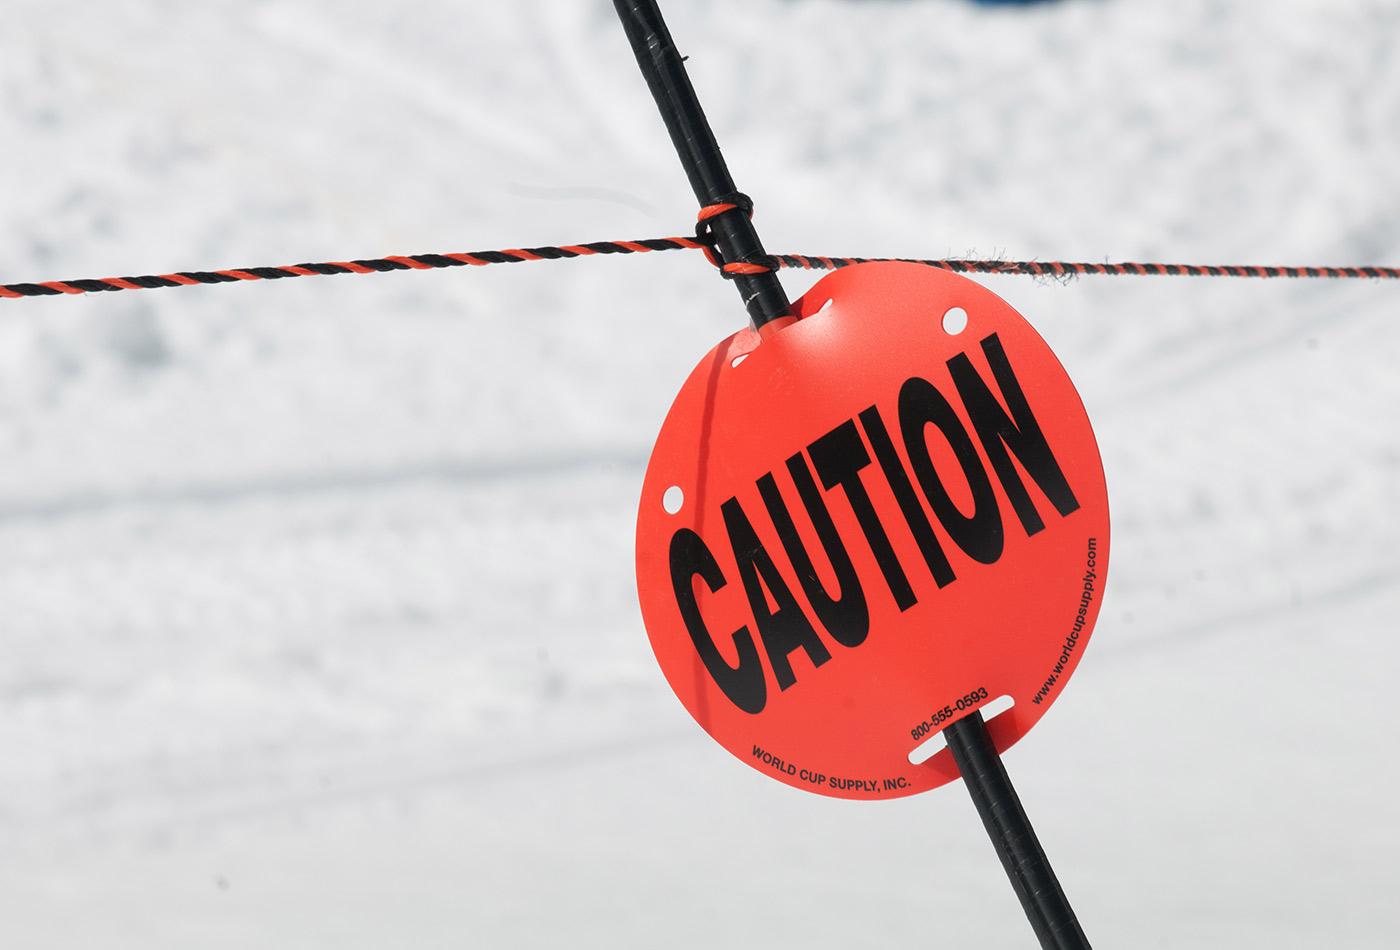 Caution sign on ski slope